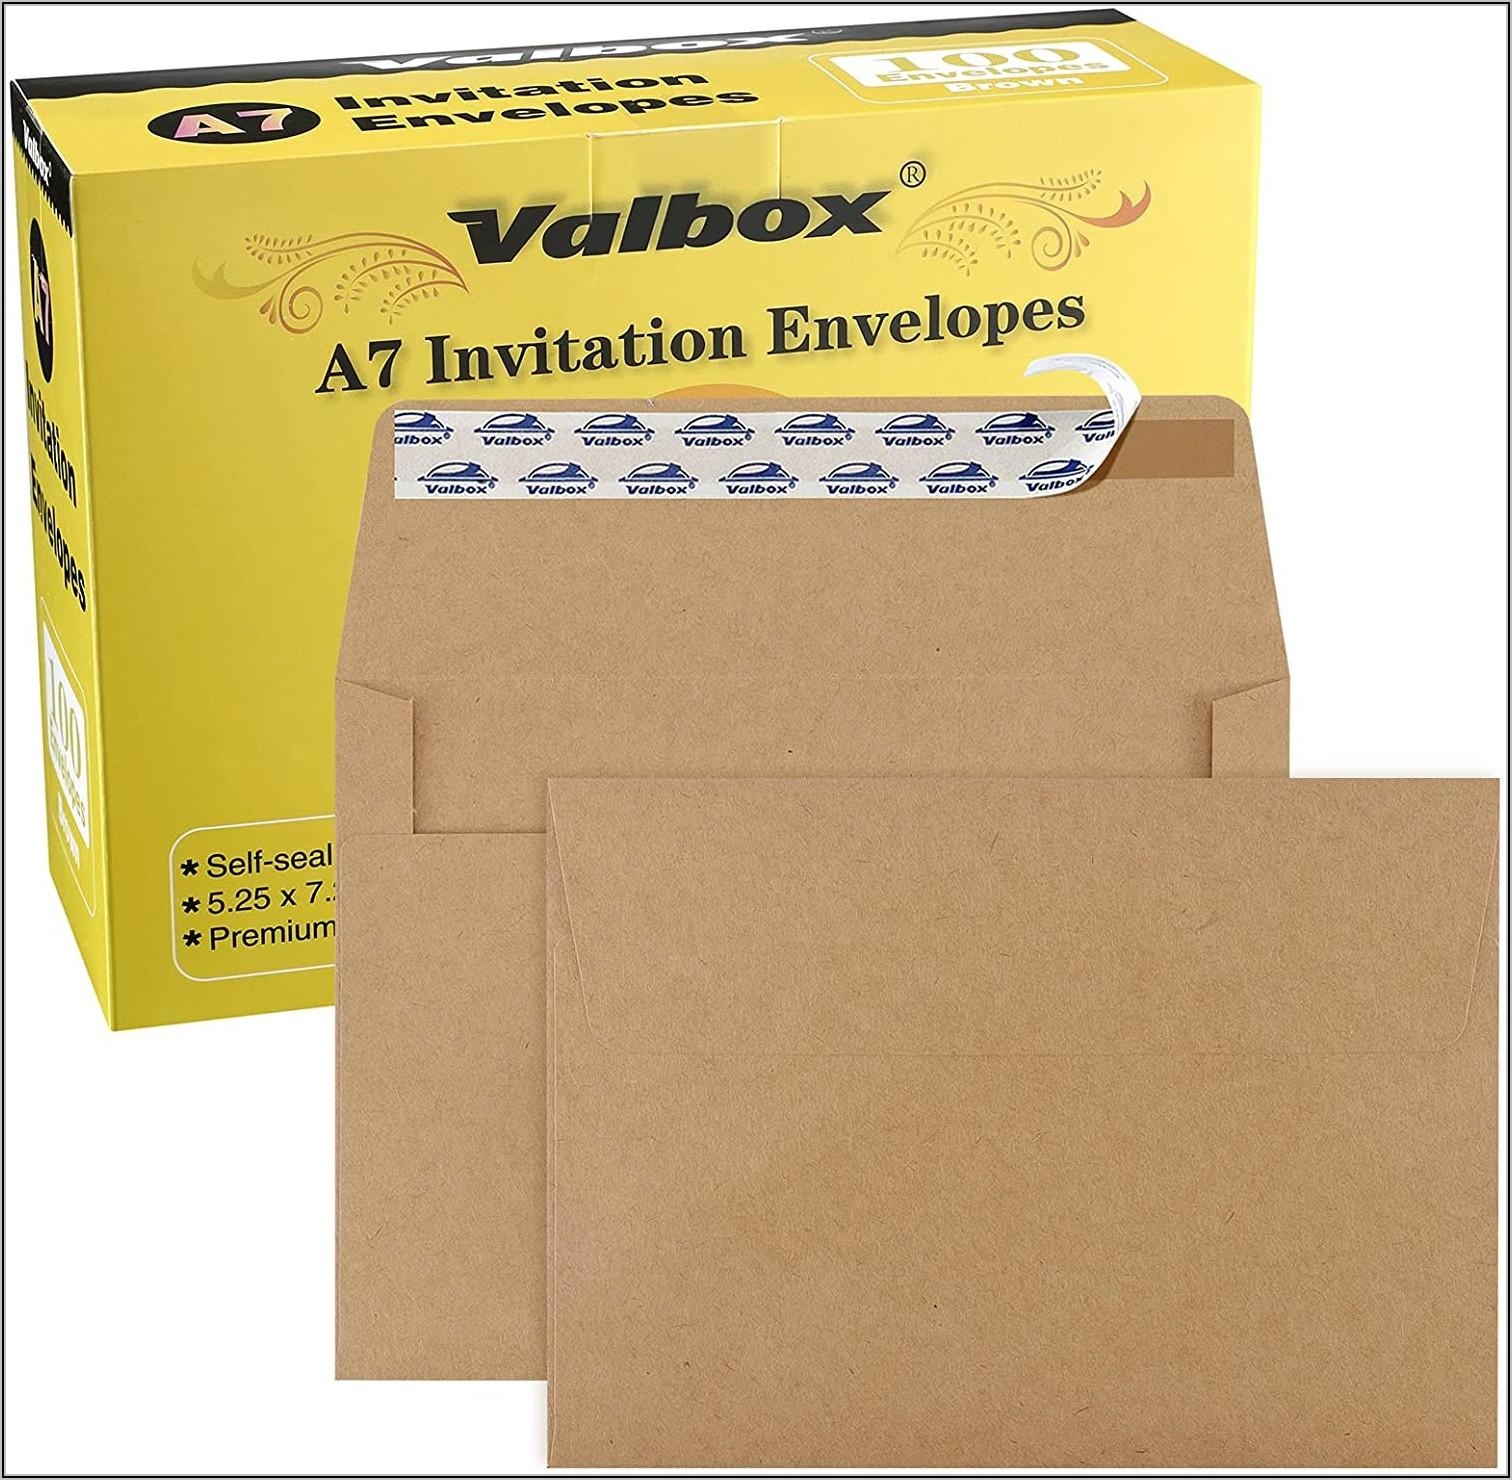 5 X 7 Invitation Envelopes